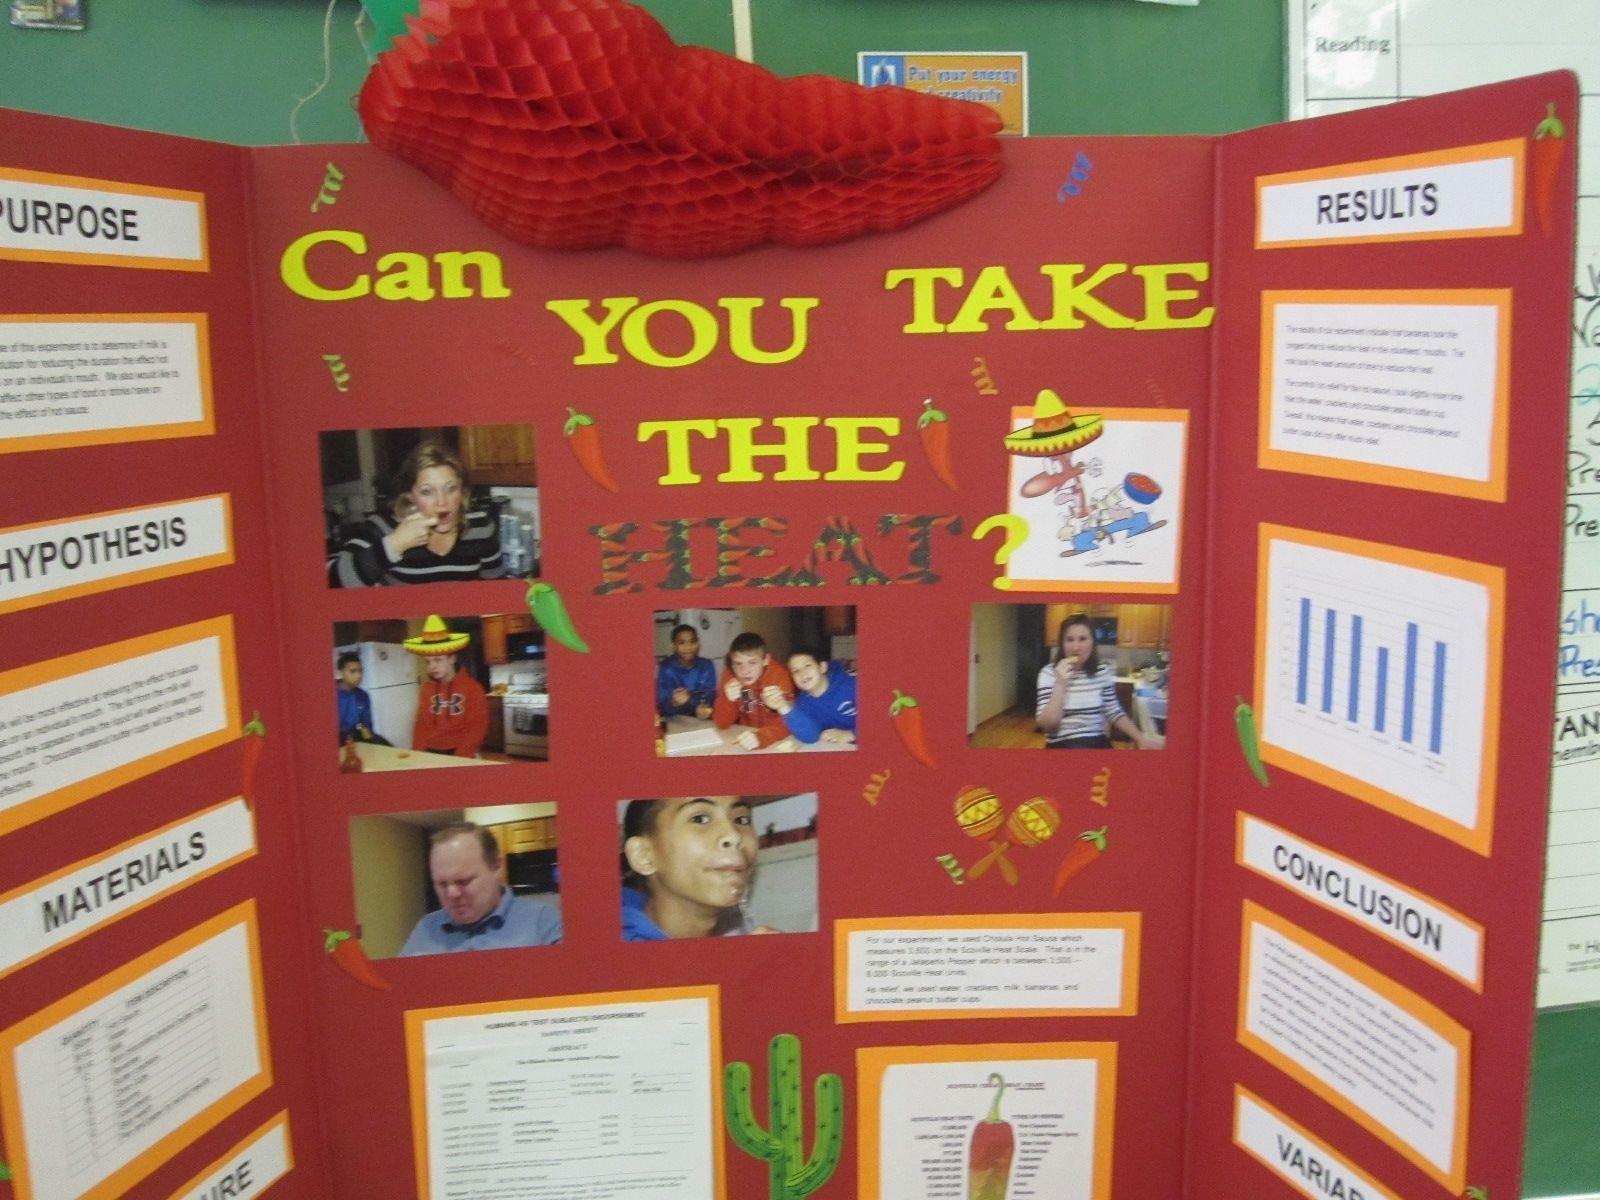 10 Spectacular Eighth Grade Science Fair Project Ideas second grade science fair topics learnkids science im kinda 13 2020